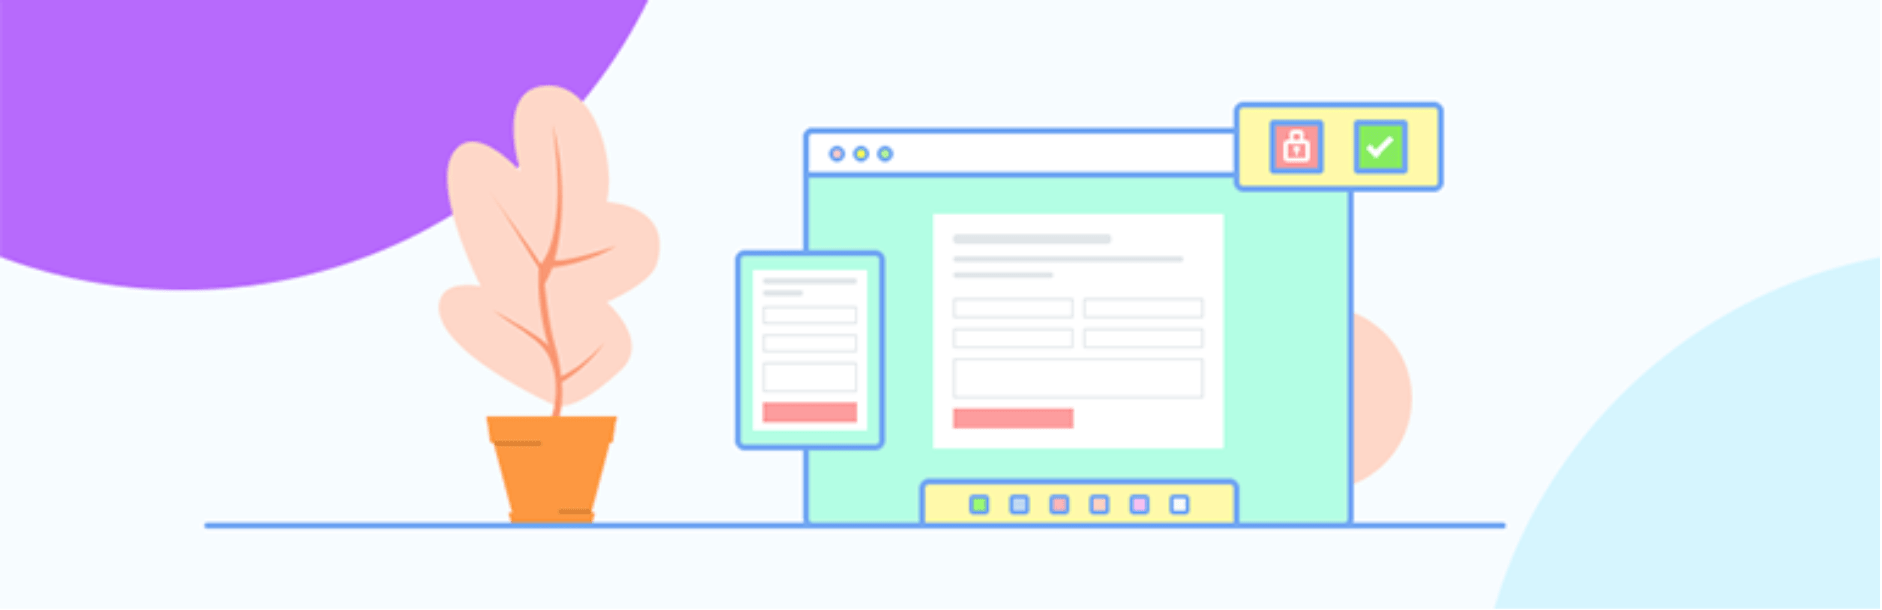 5 Best WordPress Plugins for Improving User Experience